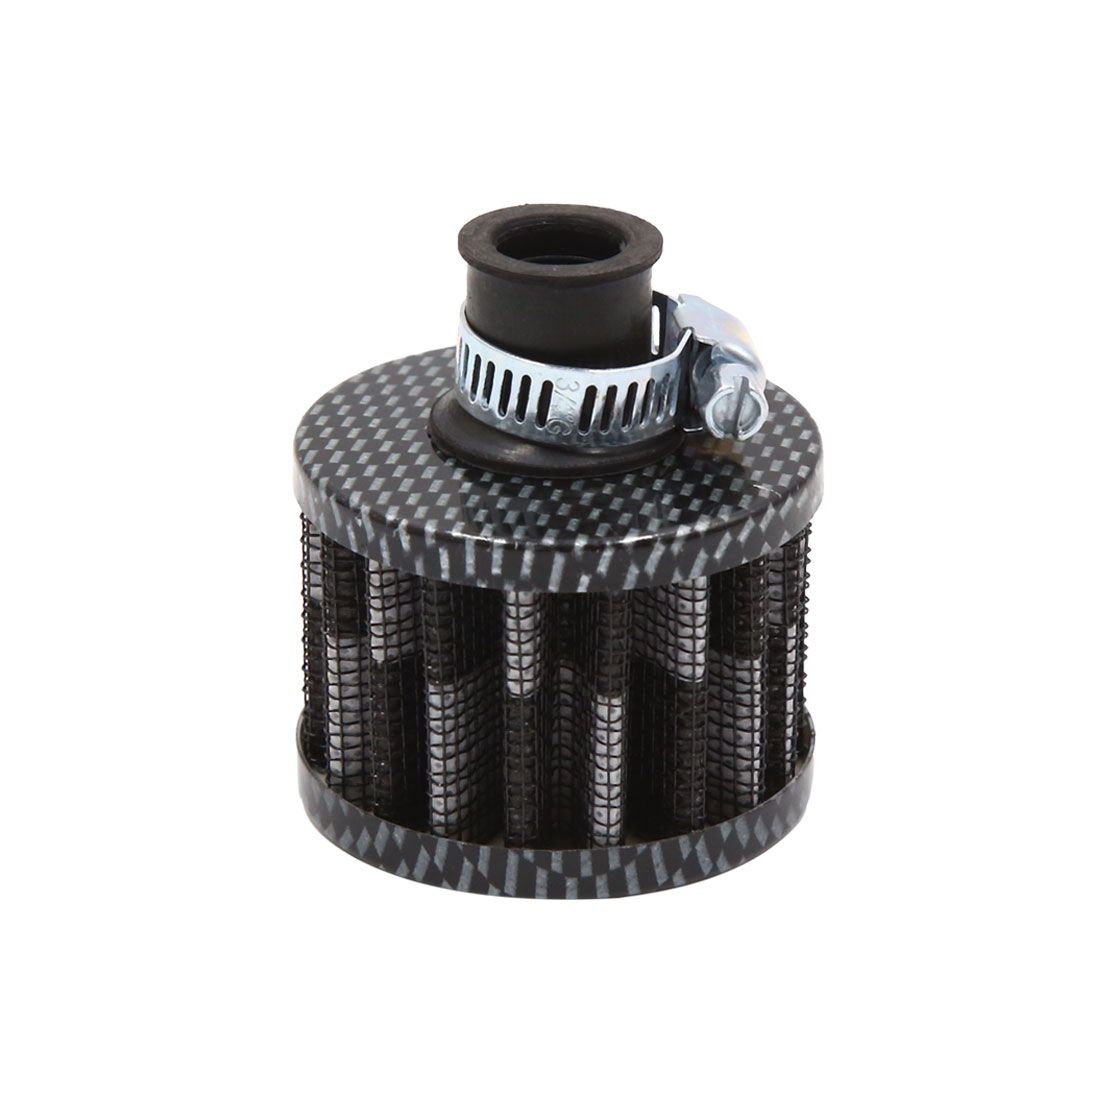 12mm Universal Cylinder Carbon Fiber Pattern Car Cold Air Intake Filter Cleaner